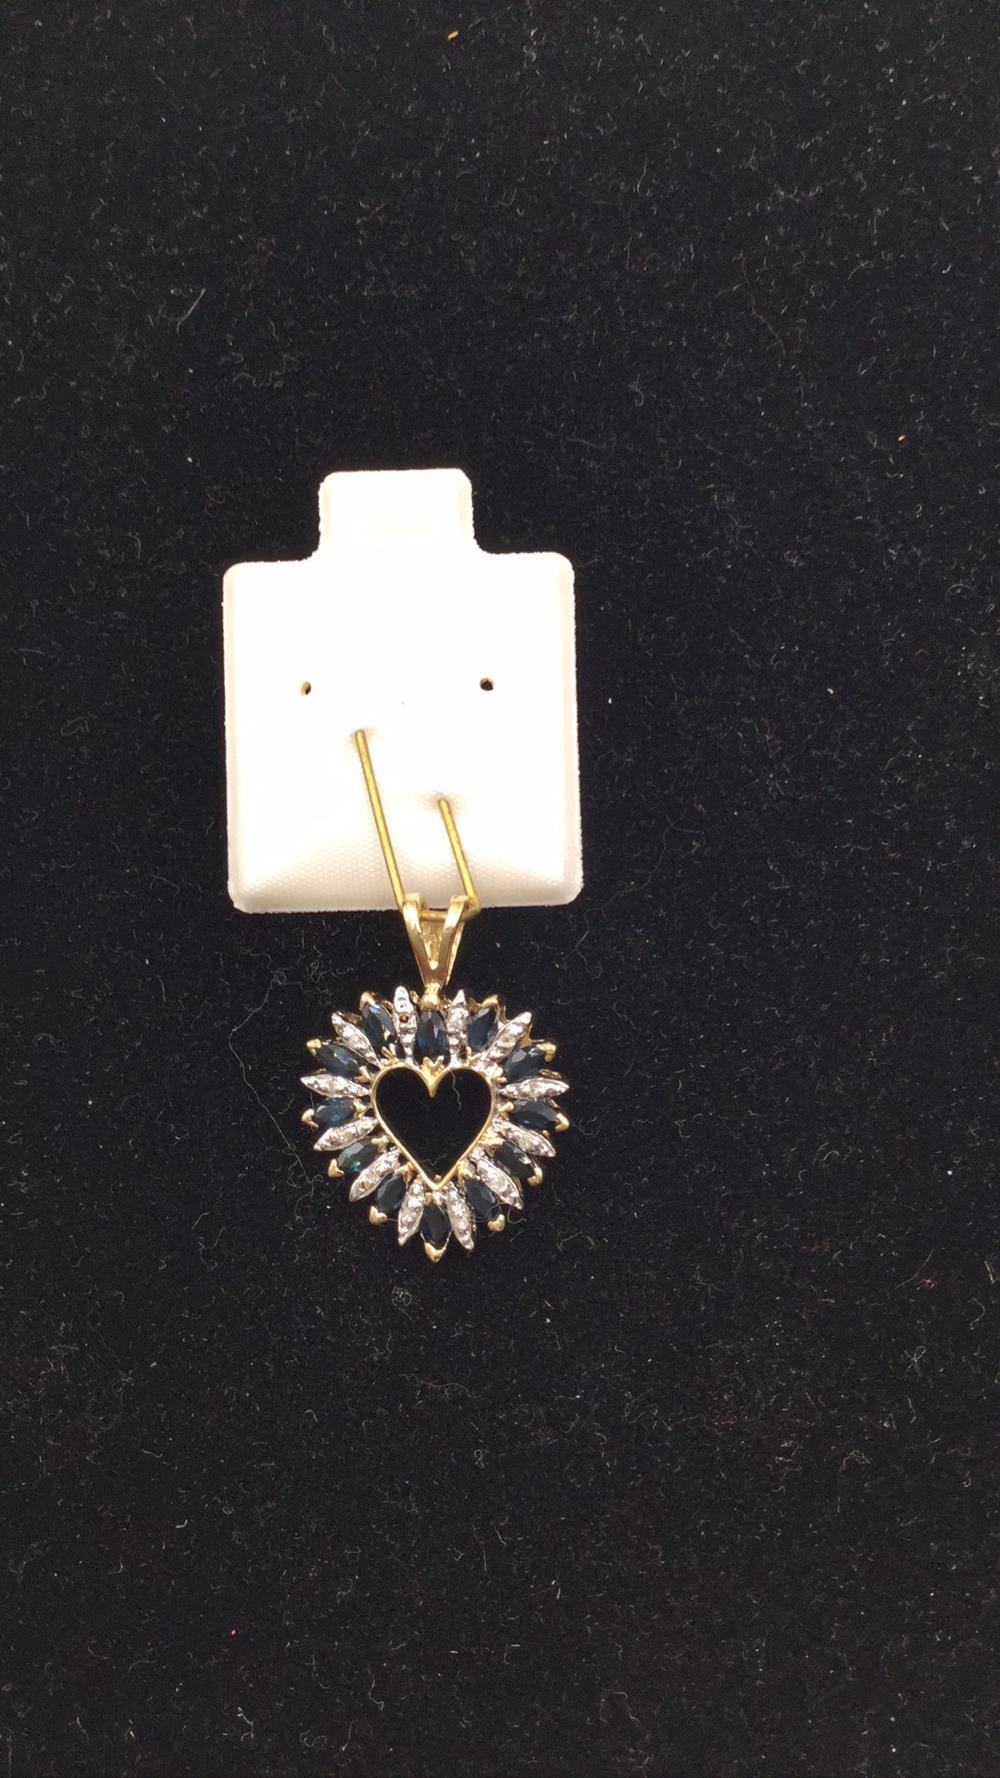 14k diamond and sapphire heart pendant